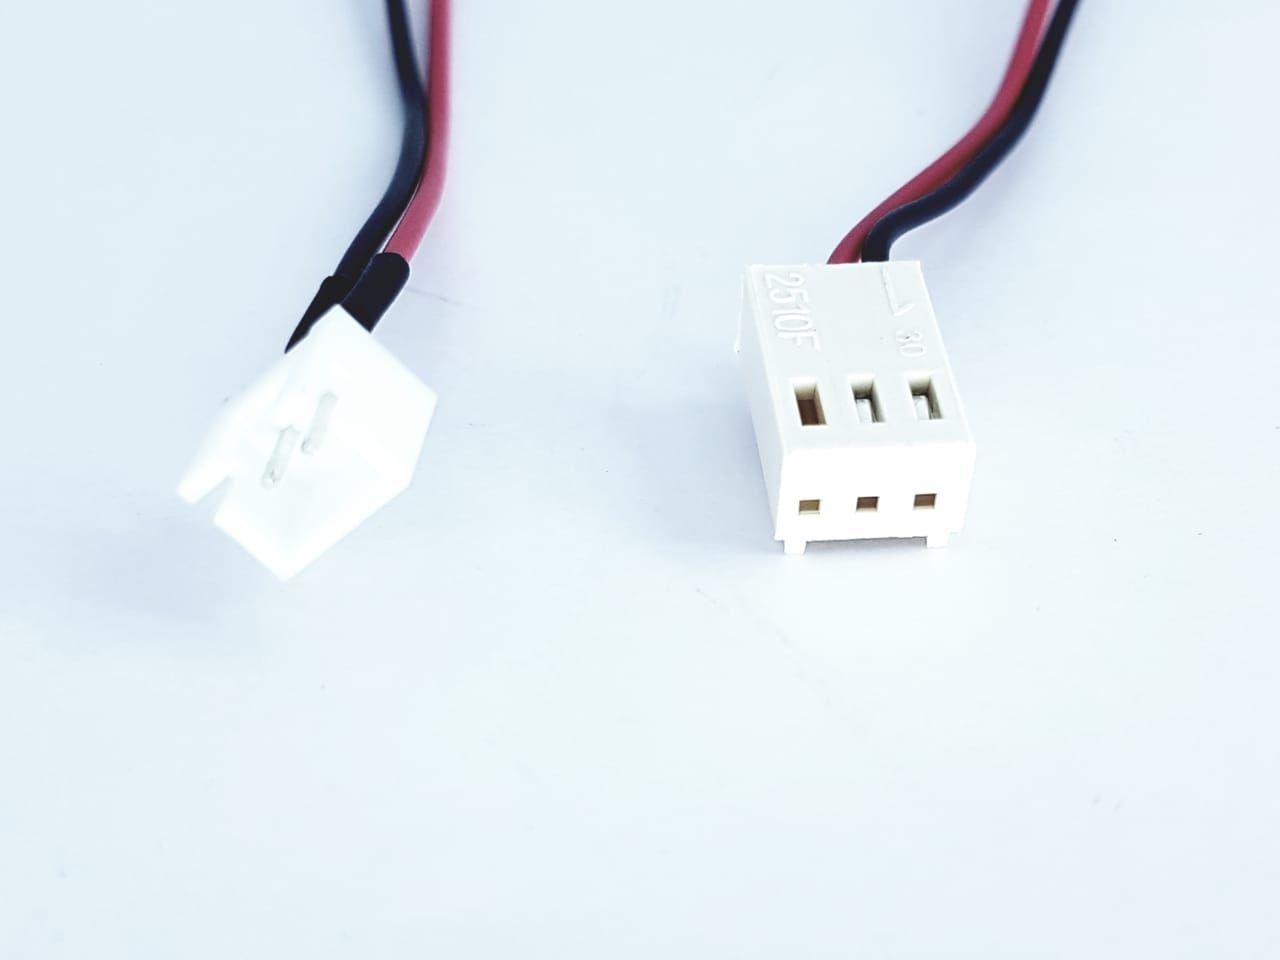 Cabo adaptador molex 3 pinos fêmea F  para 2 pinos macho 30 cm cooler ventilador